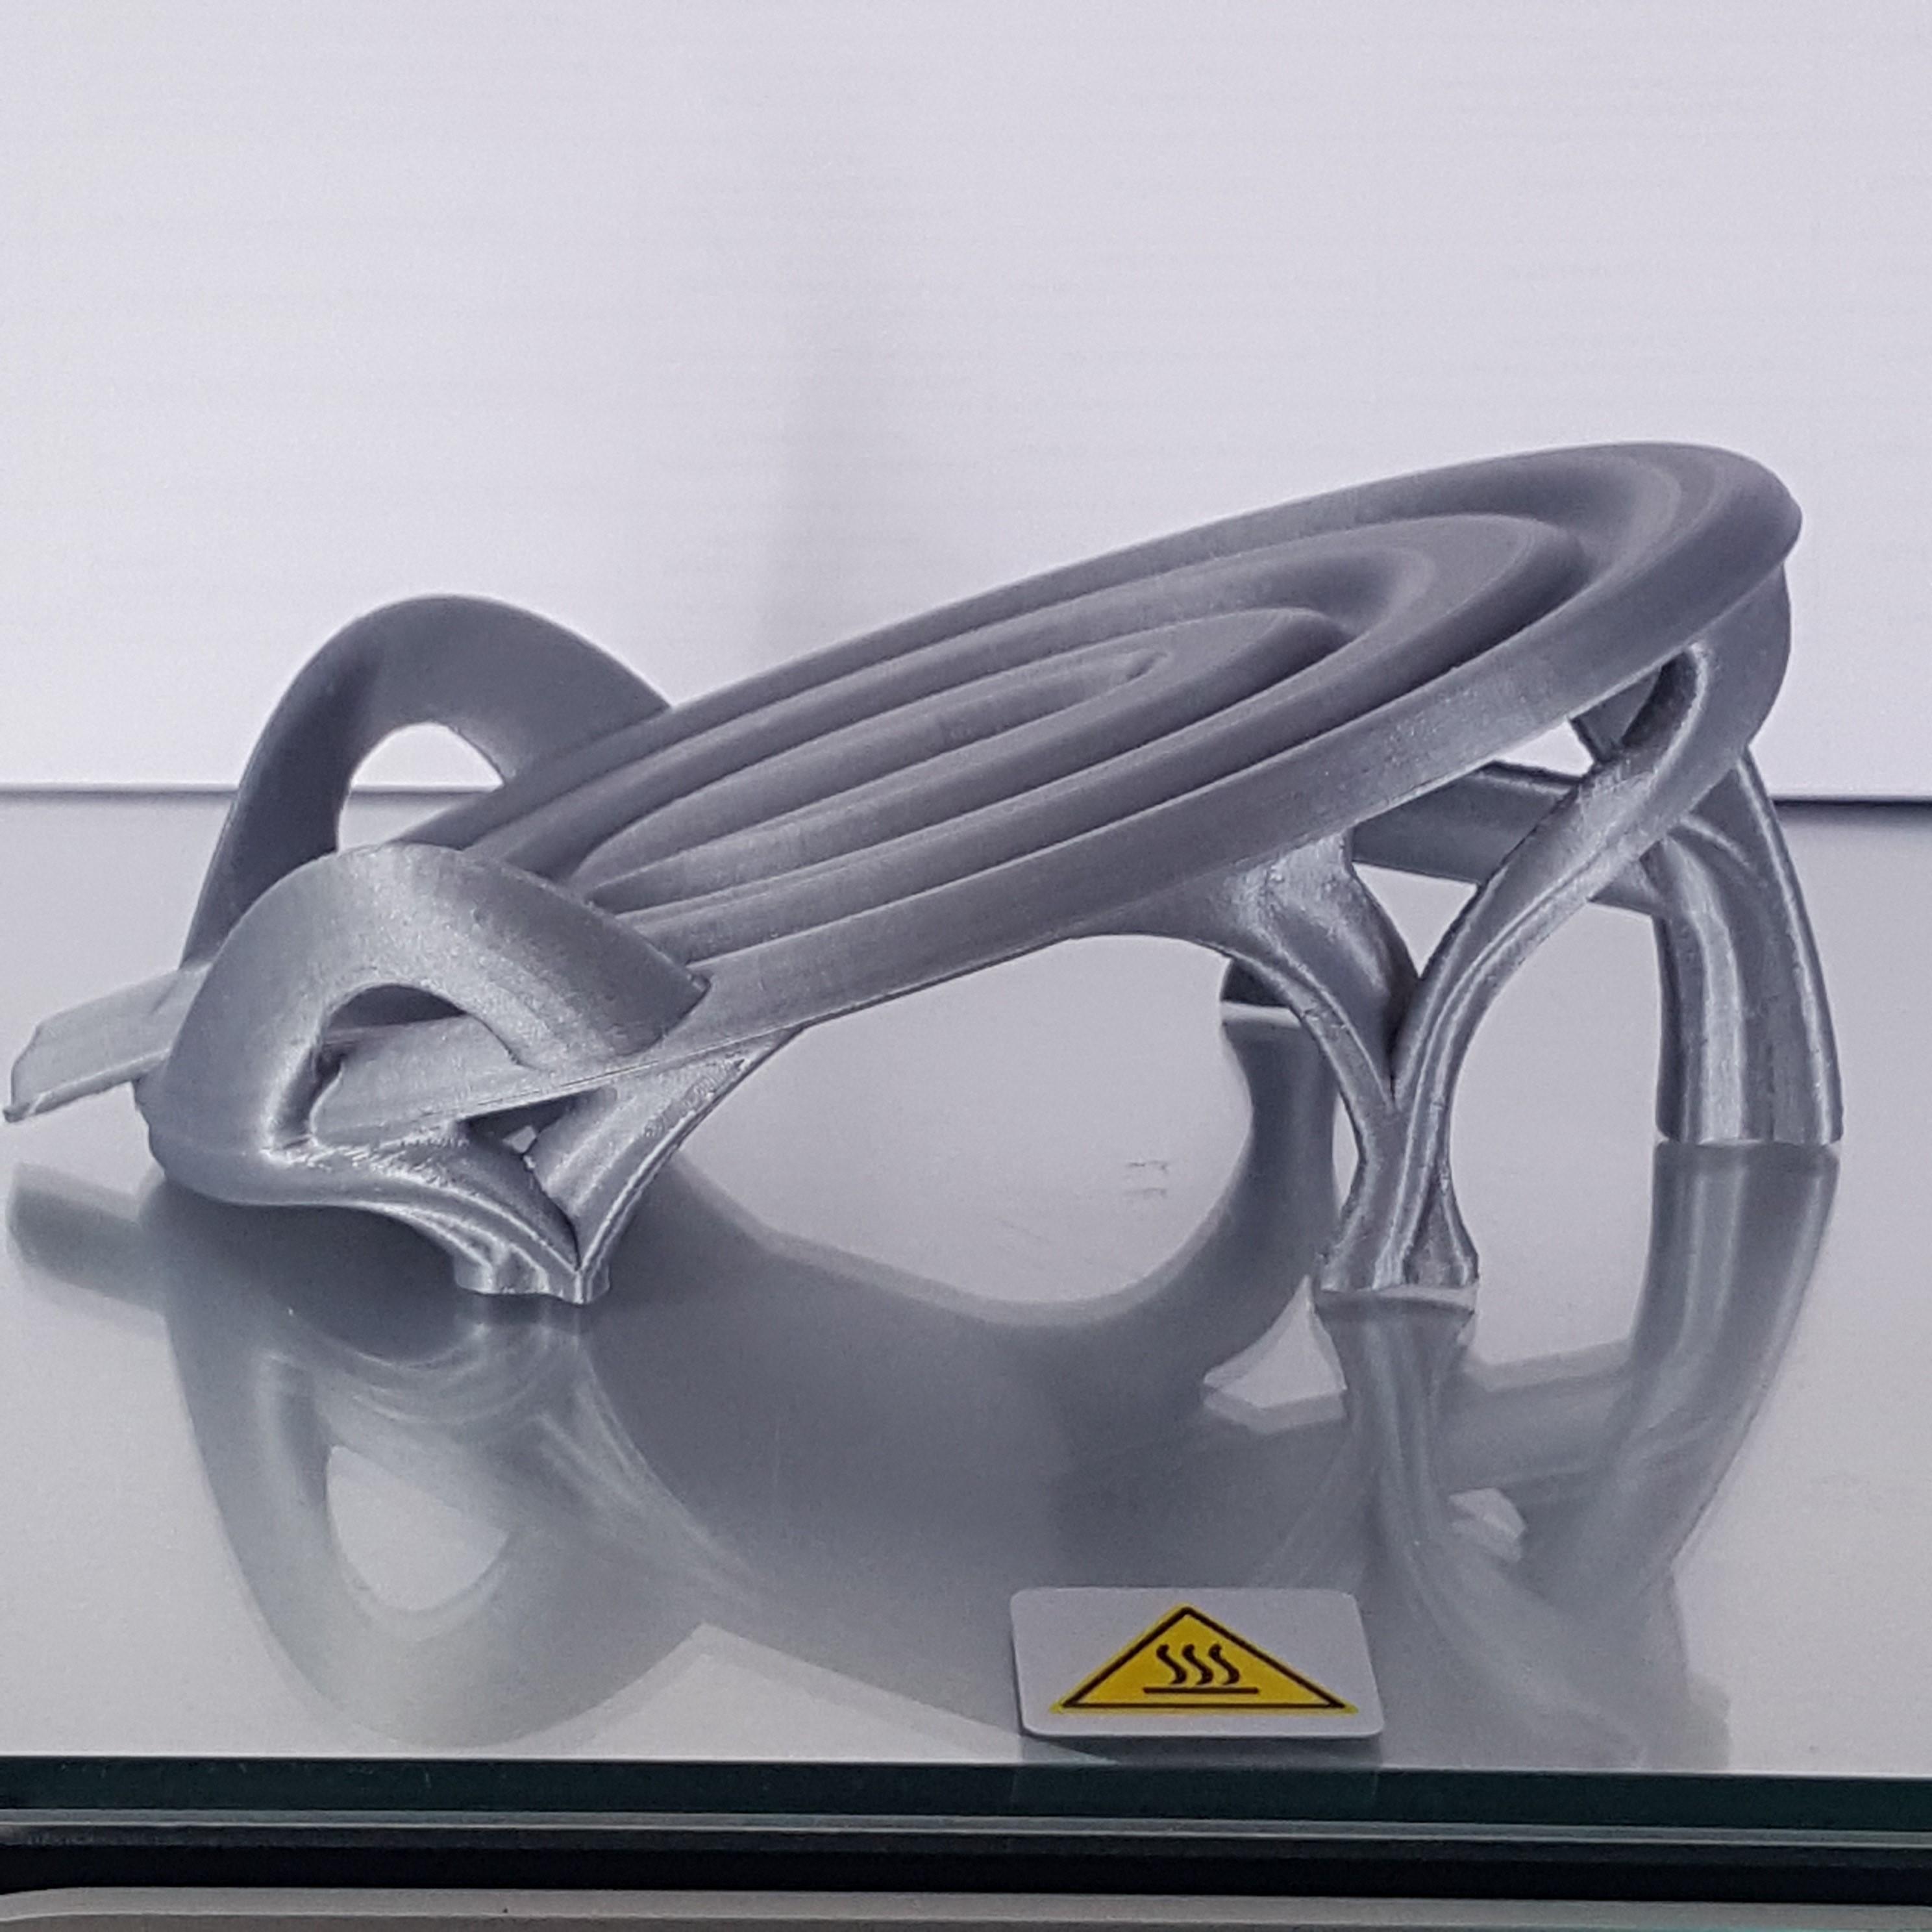 savon.jpg Download free STL file soap dish • 3D printer template, mrj33